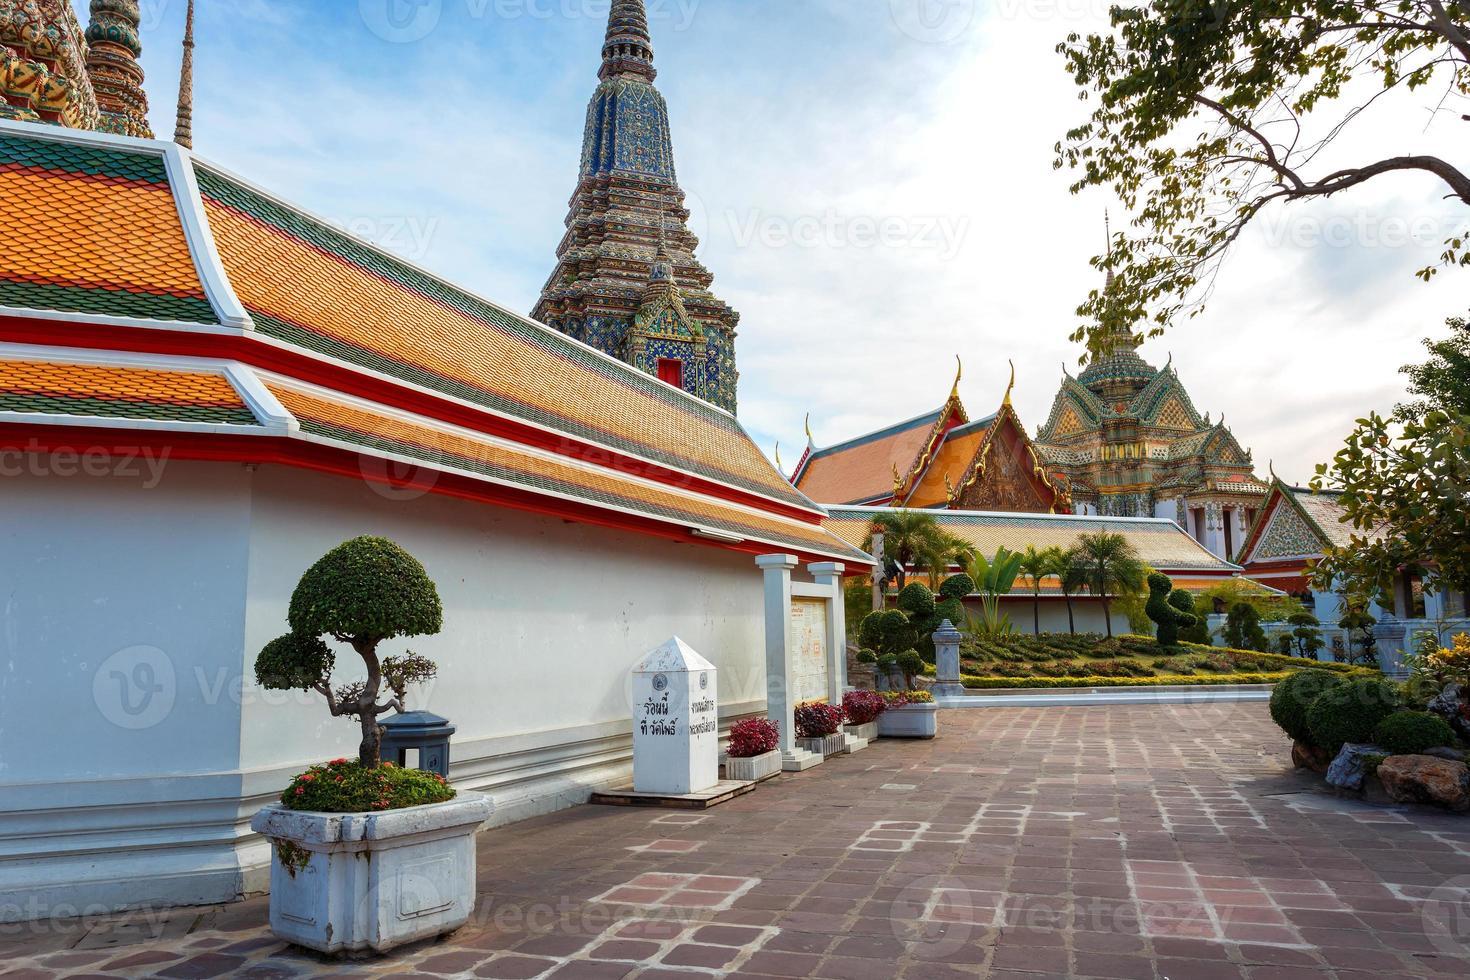 Wat Pho (templo de Pho) en Bangkok, Tailandia foto